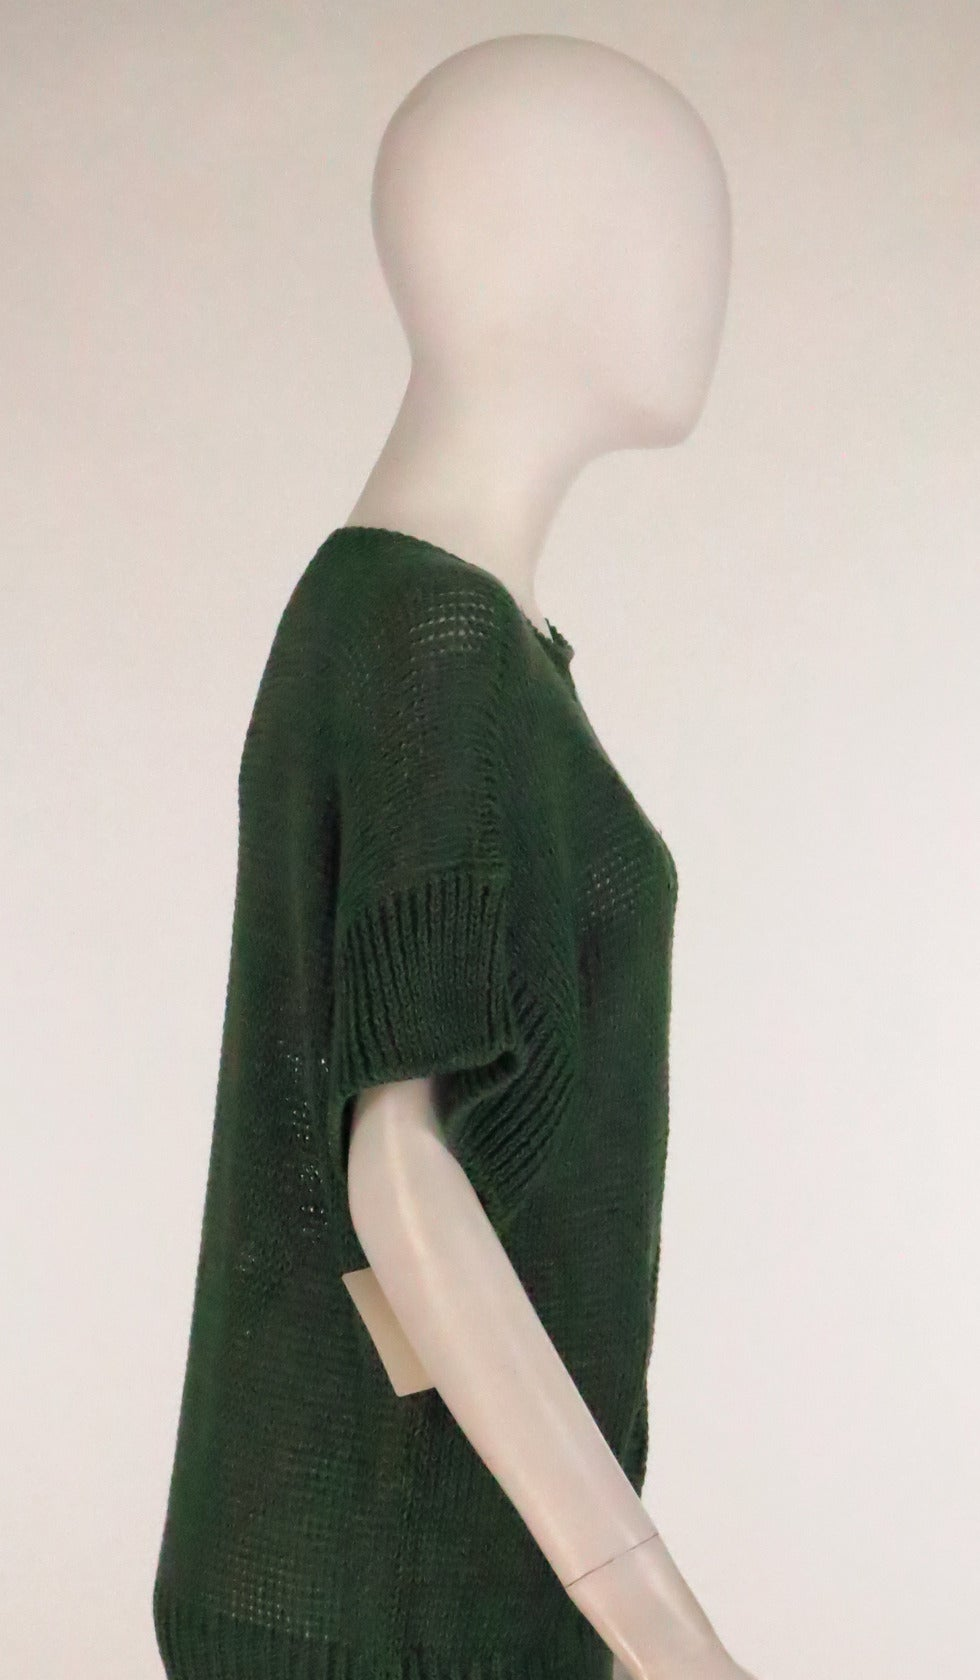 1980s Jil Sander pine green sweater knit tunic For Sale 1